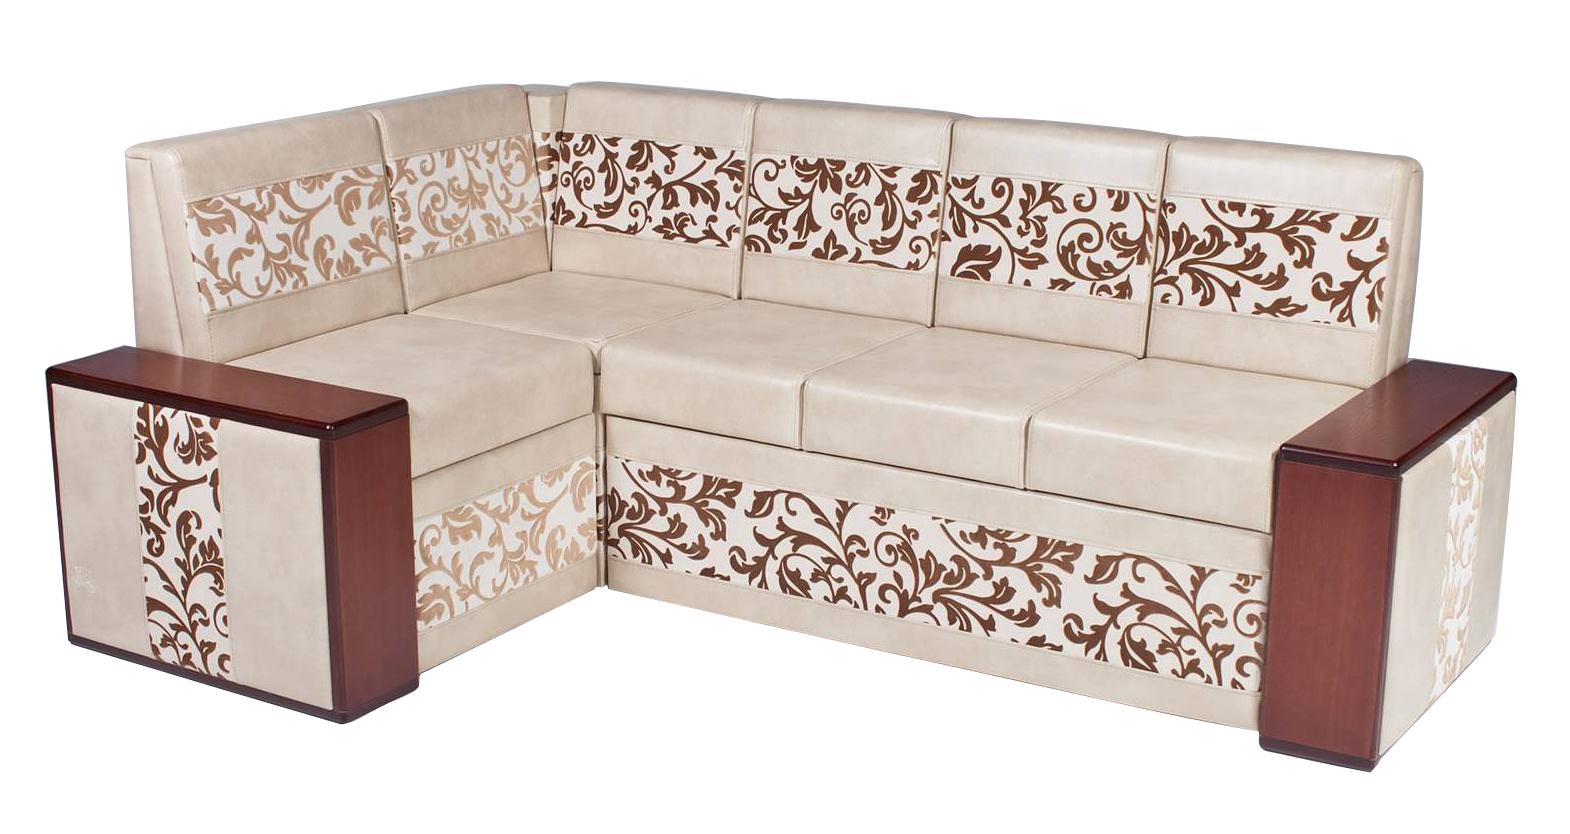 Кухонный угловой диван Остин-Т фото